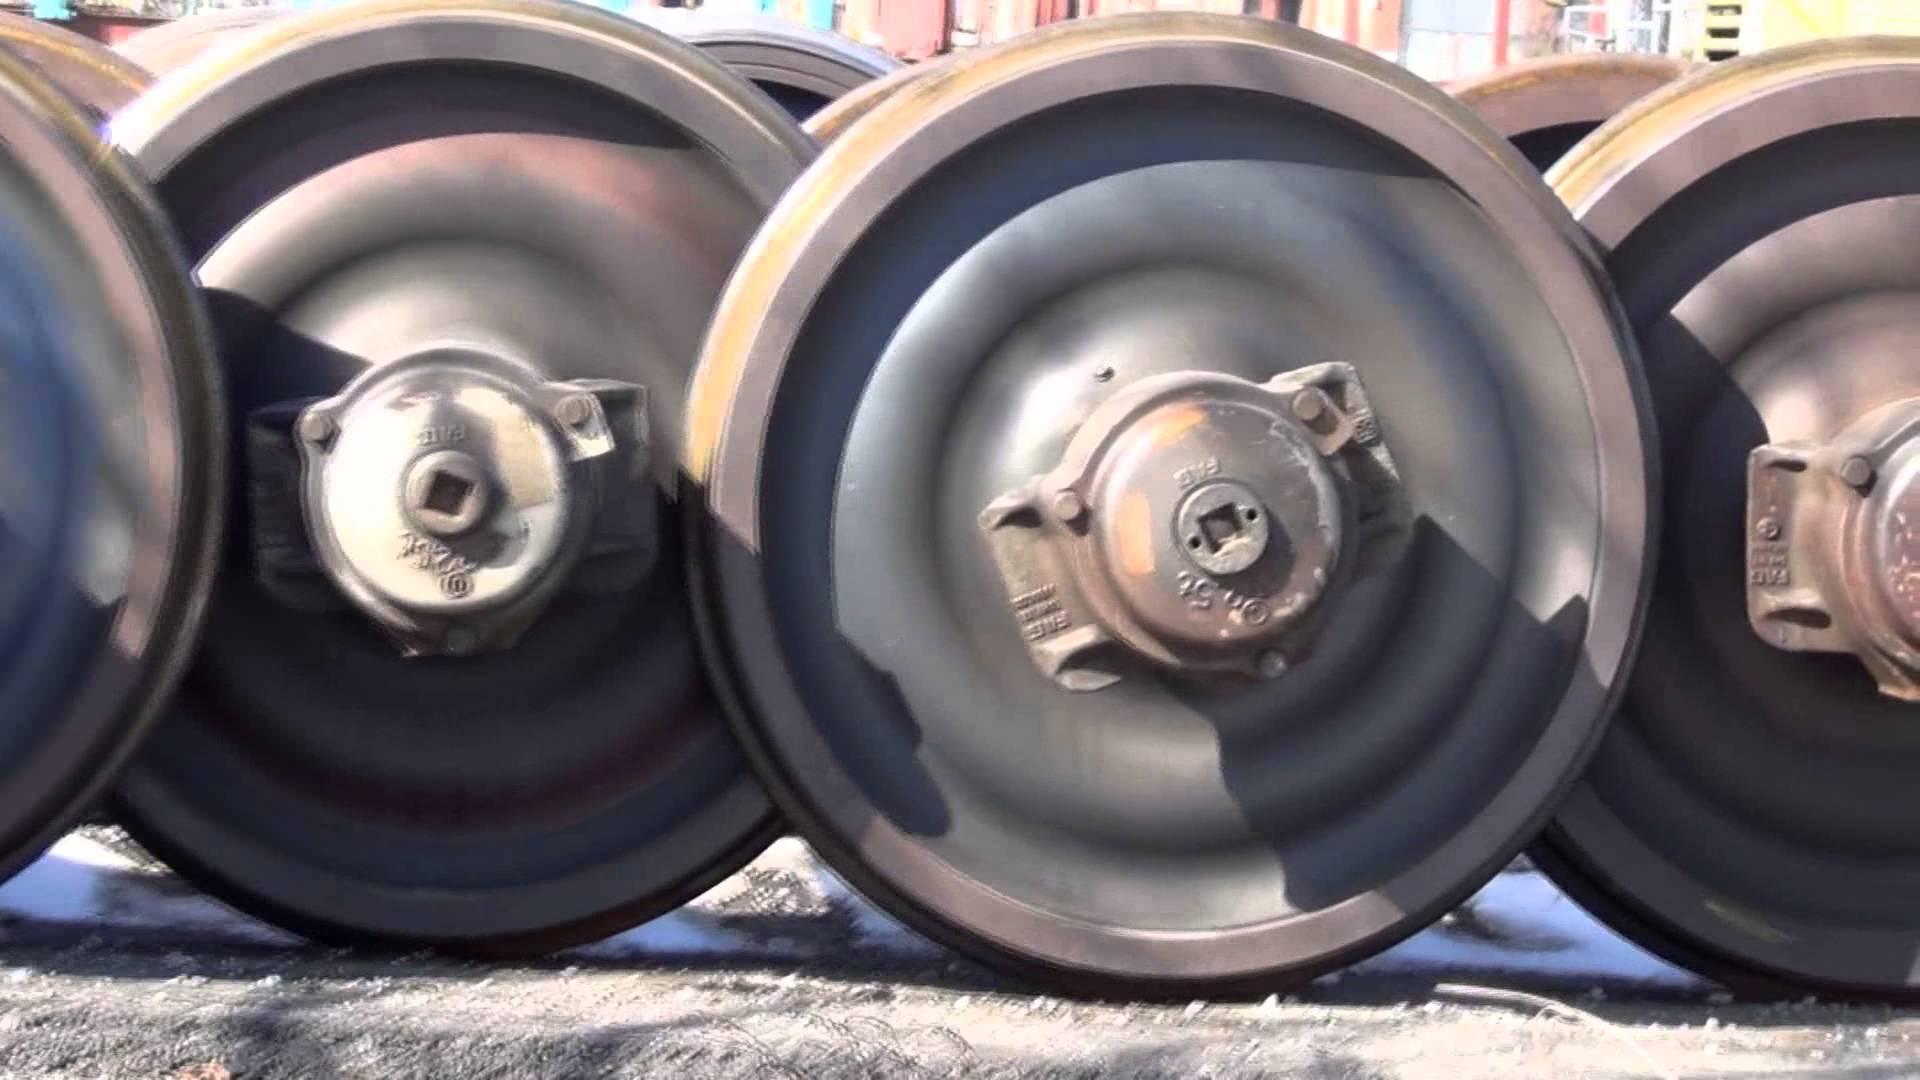 Train wheel photo